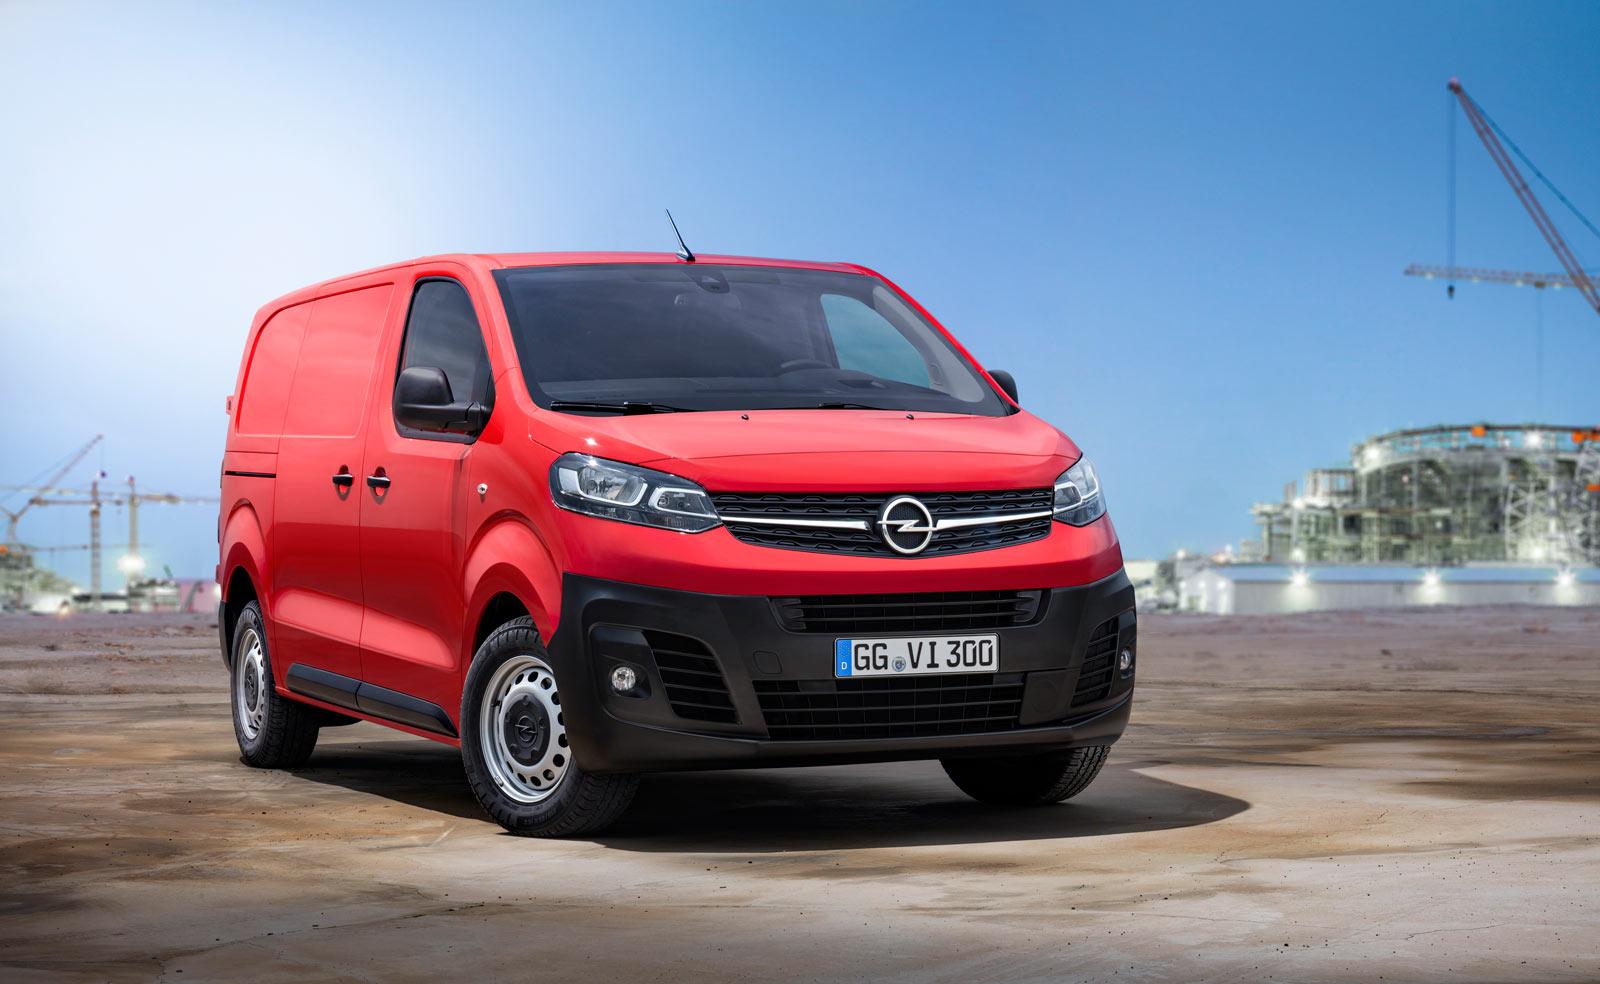 Nowy Opel Vivaro C 2019 2020 Opel Dixi Car